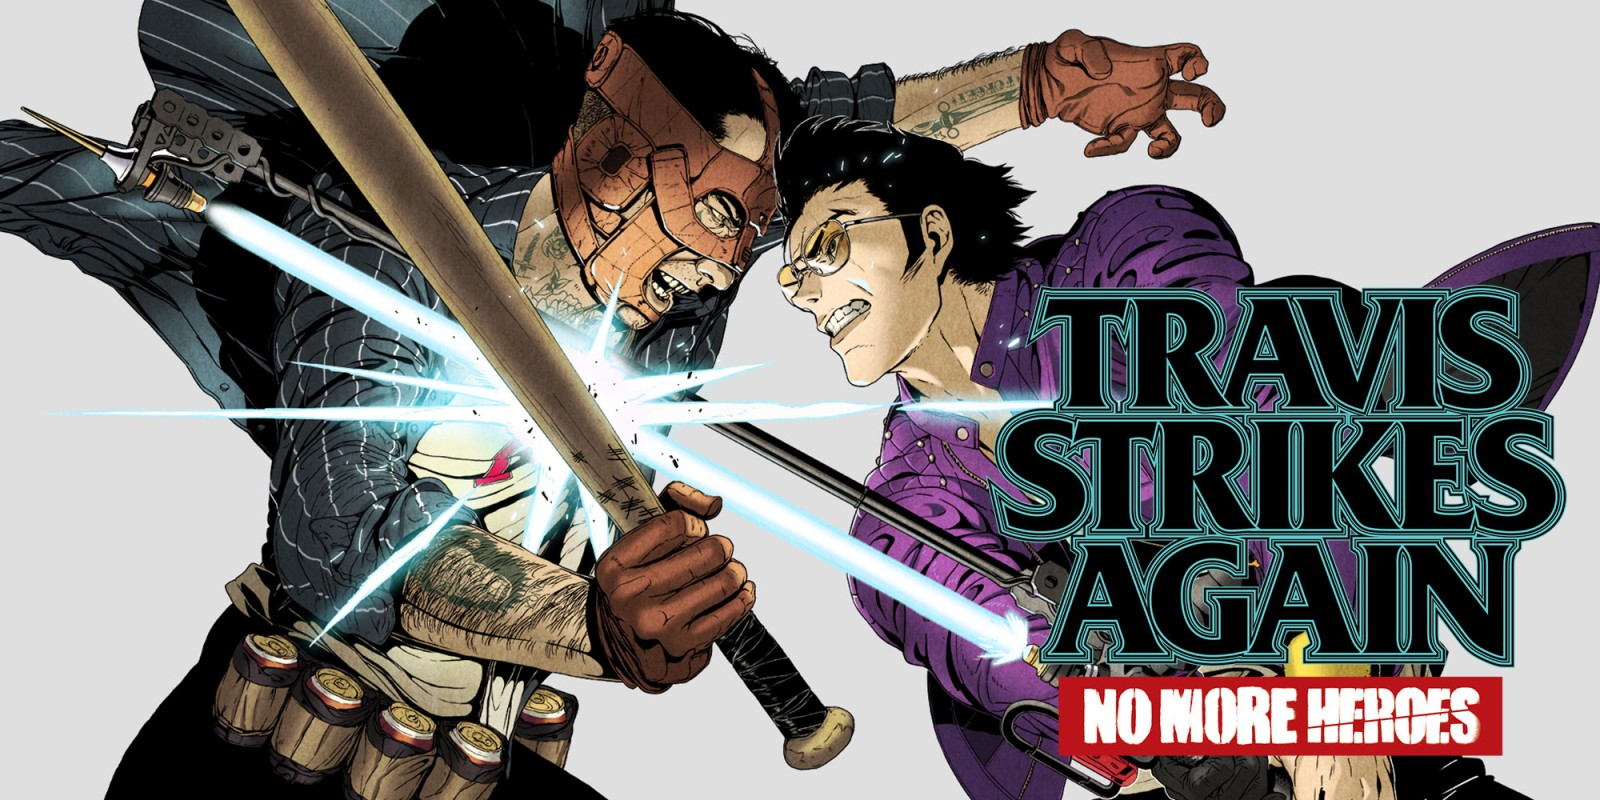 no more heroes travis strikes again